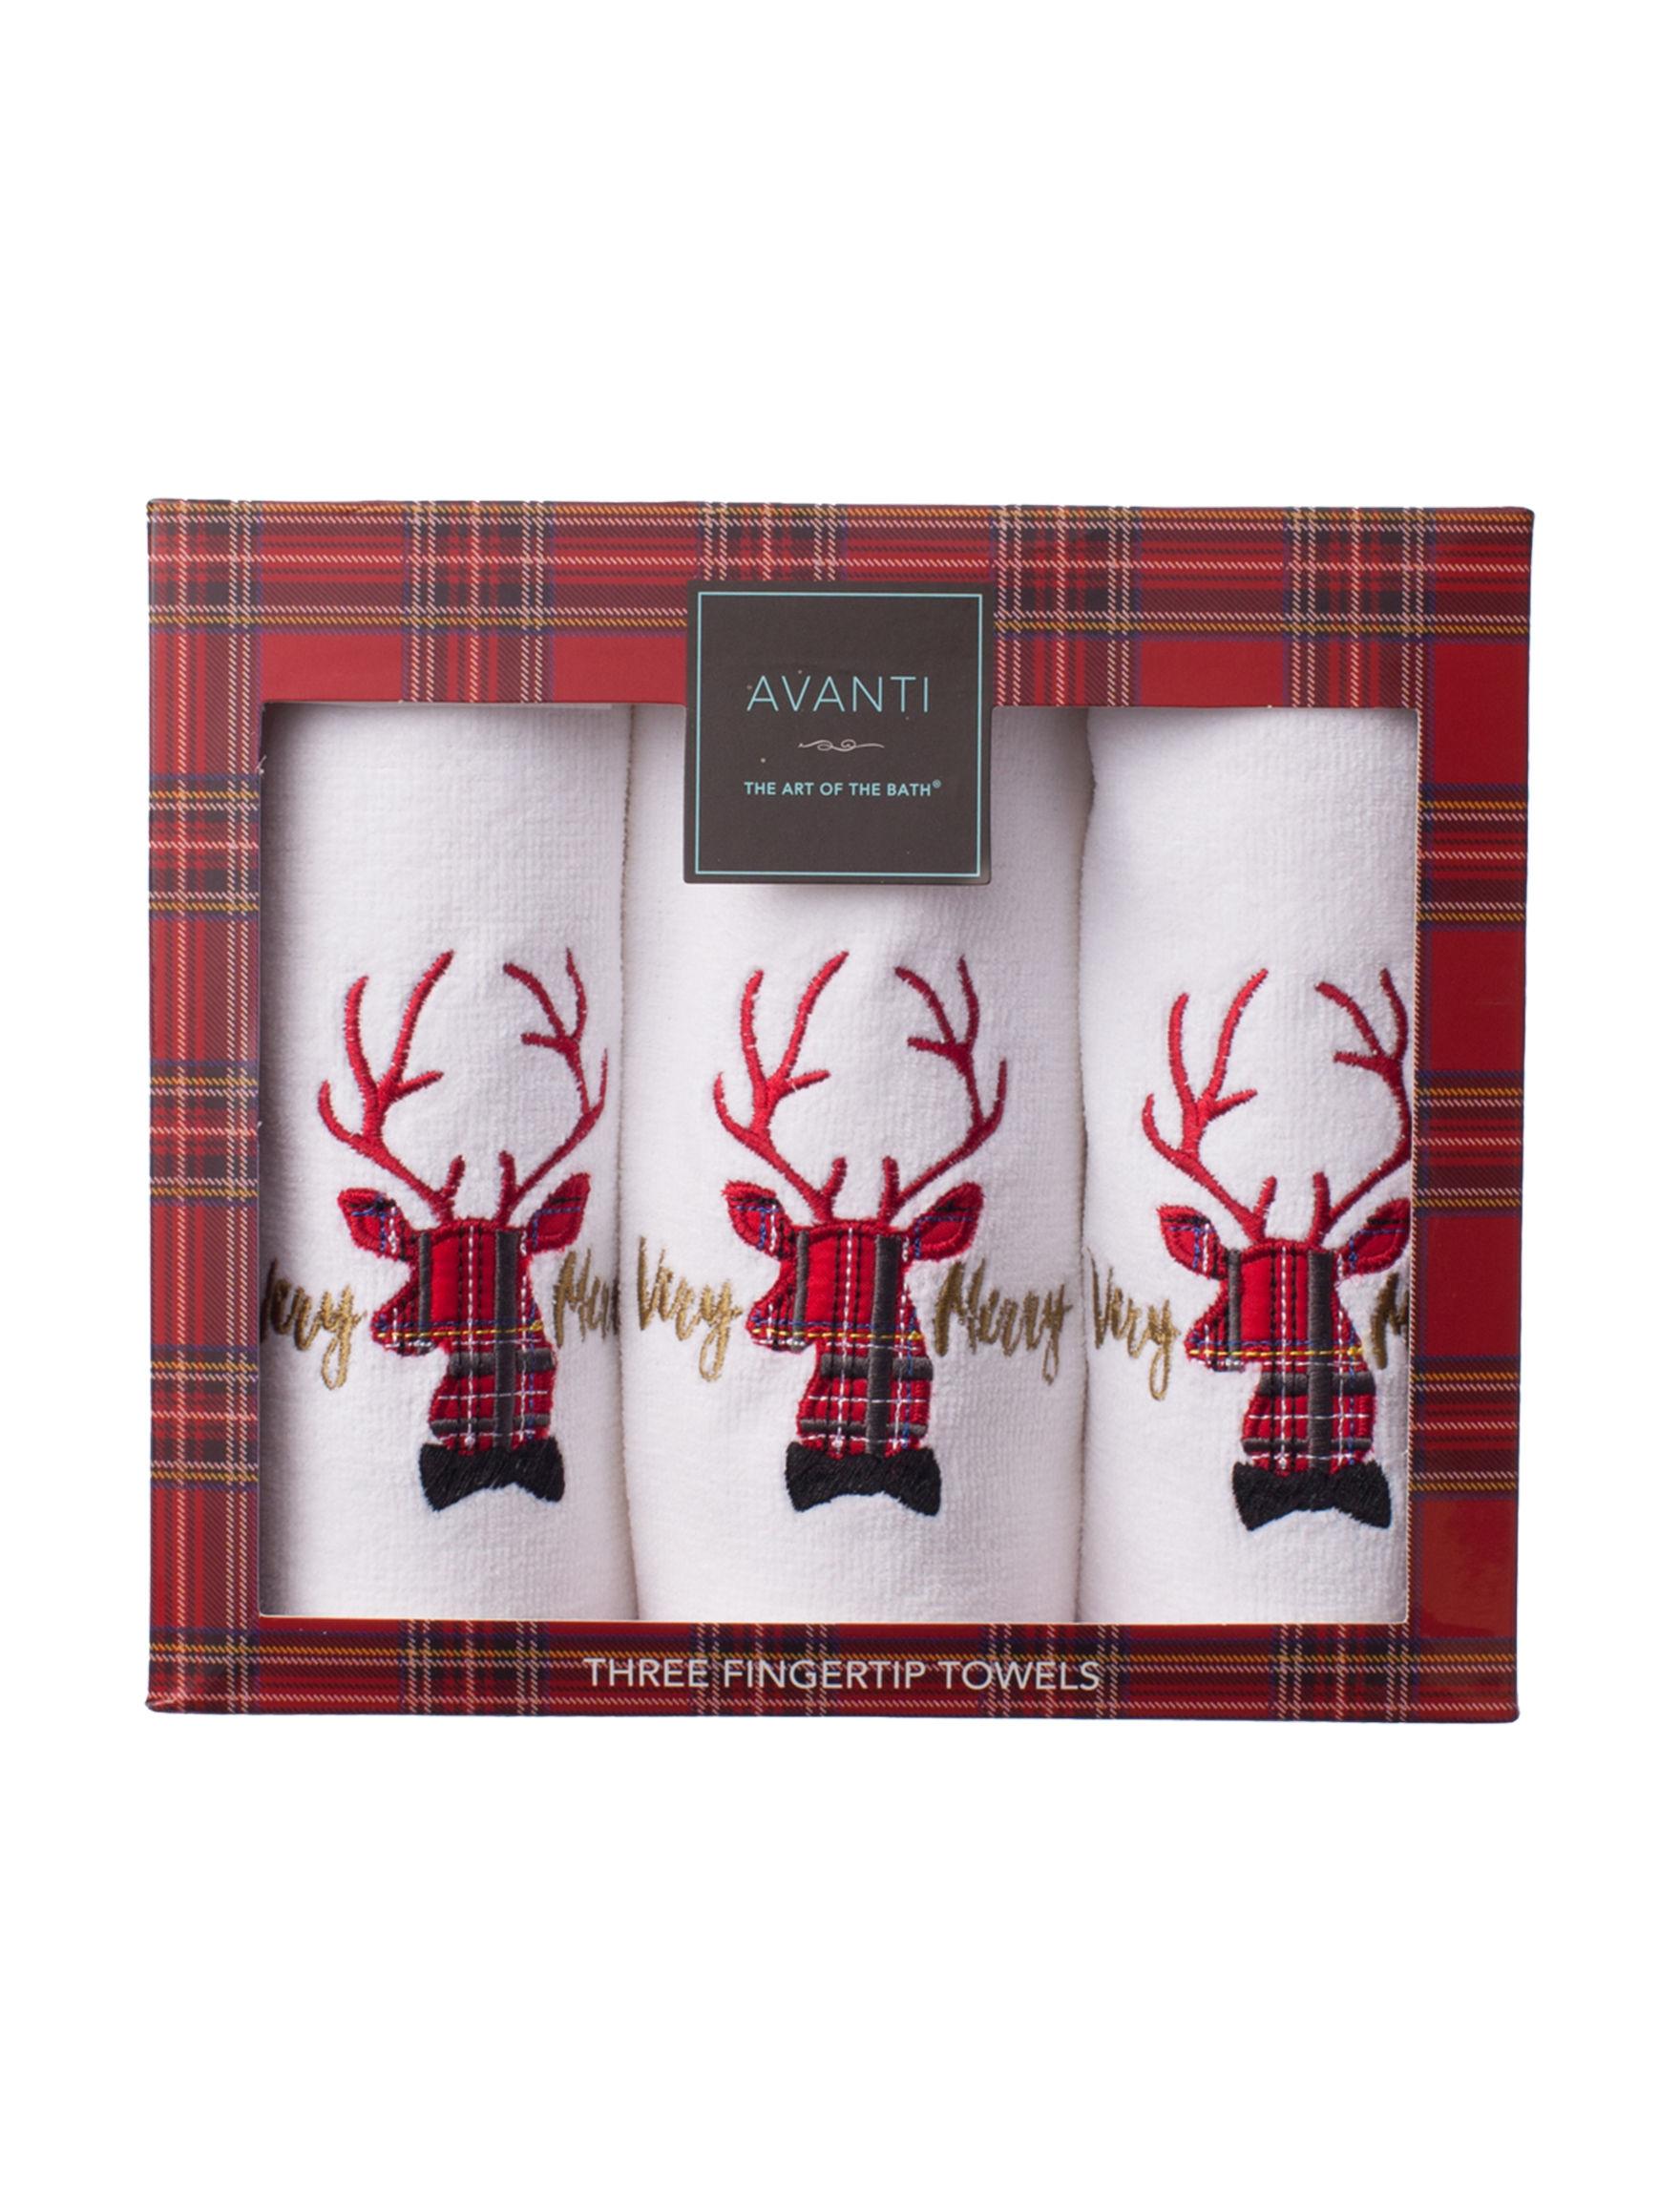 Avanti White / Red Fingertip Towels Towels